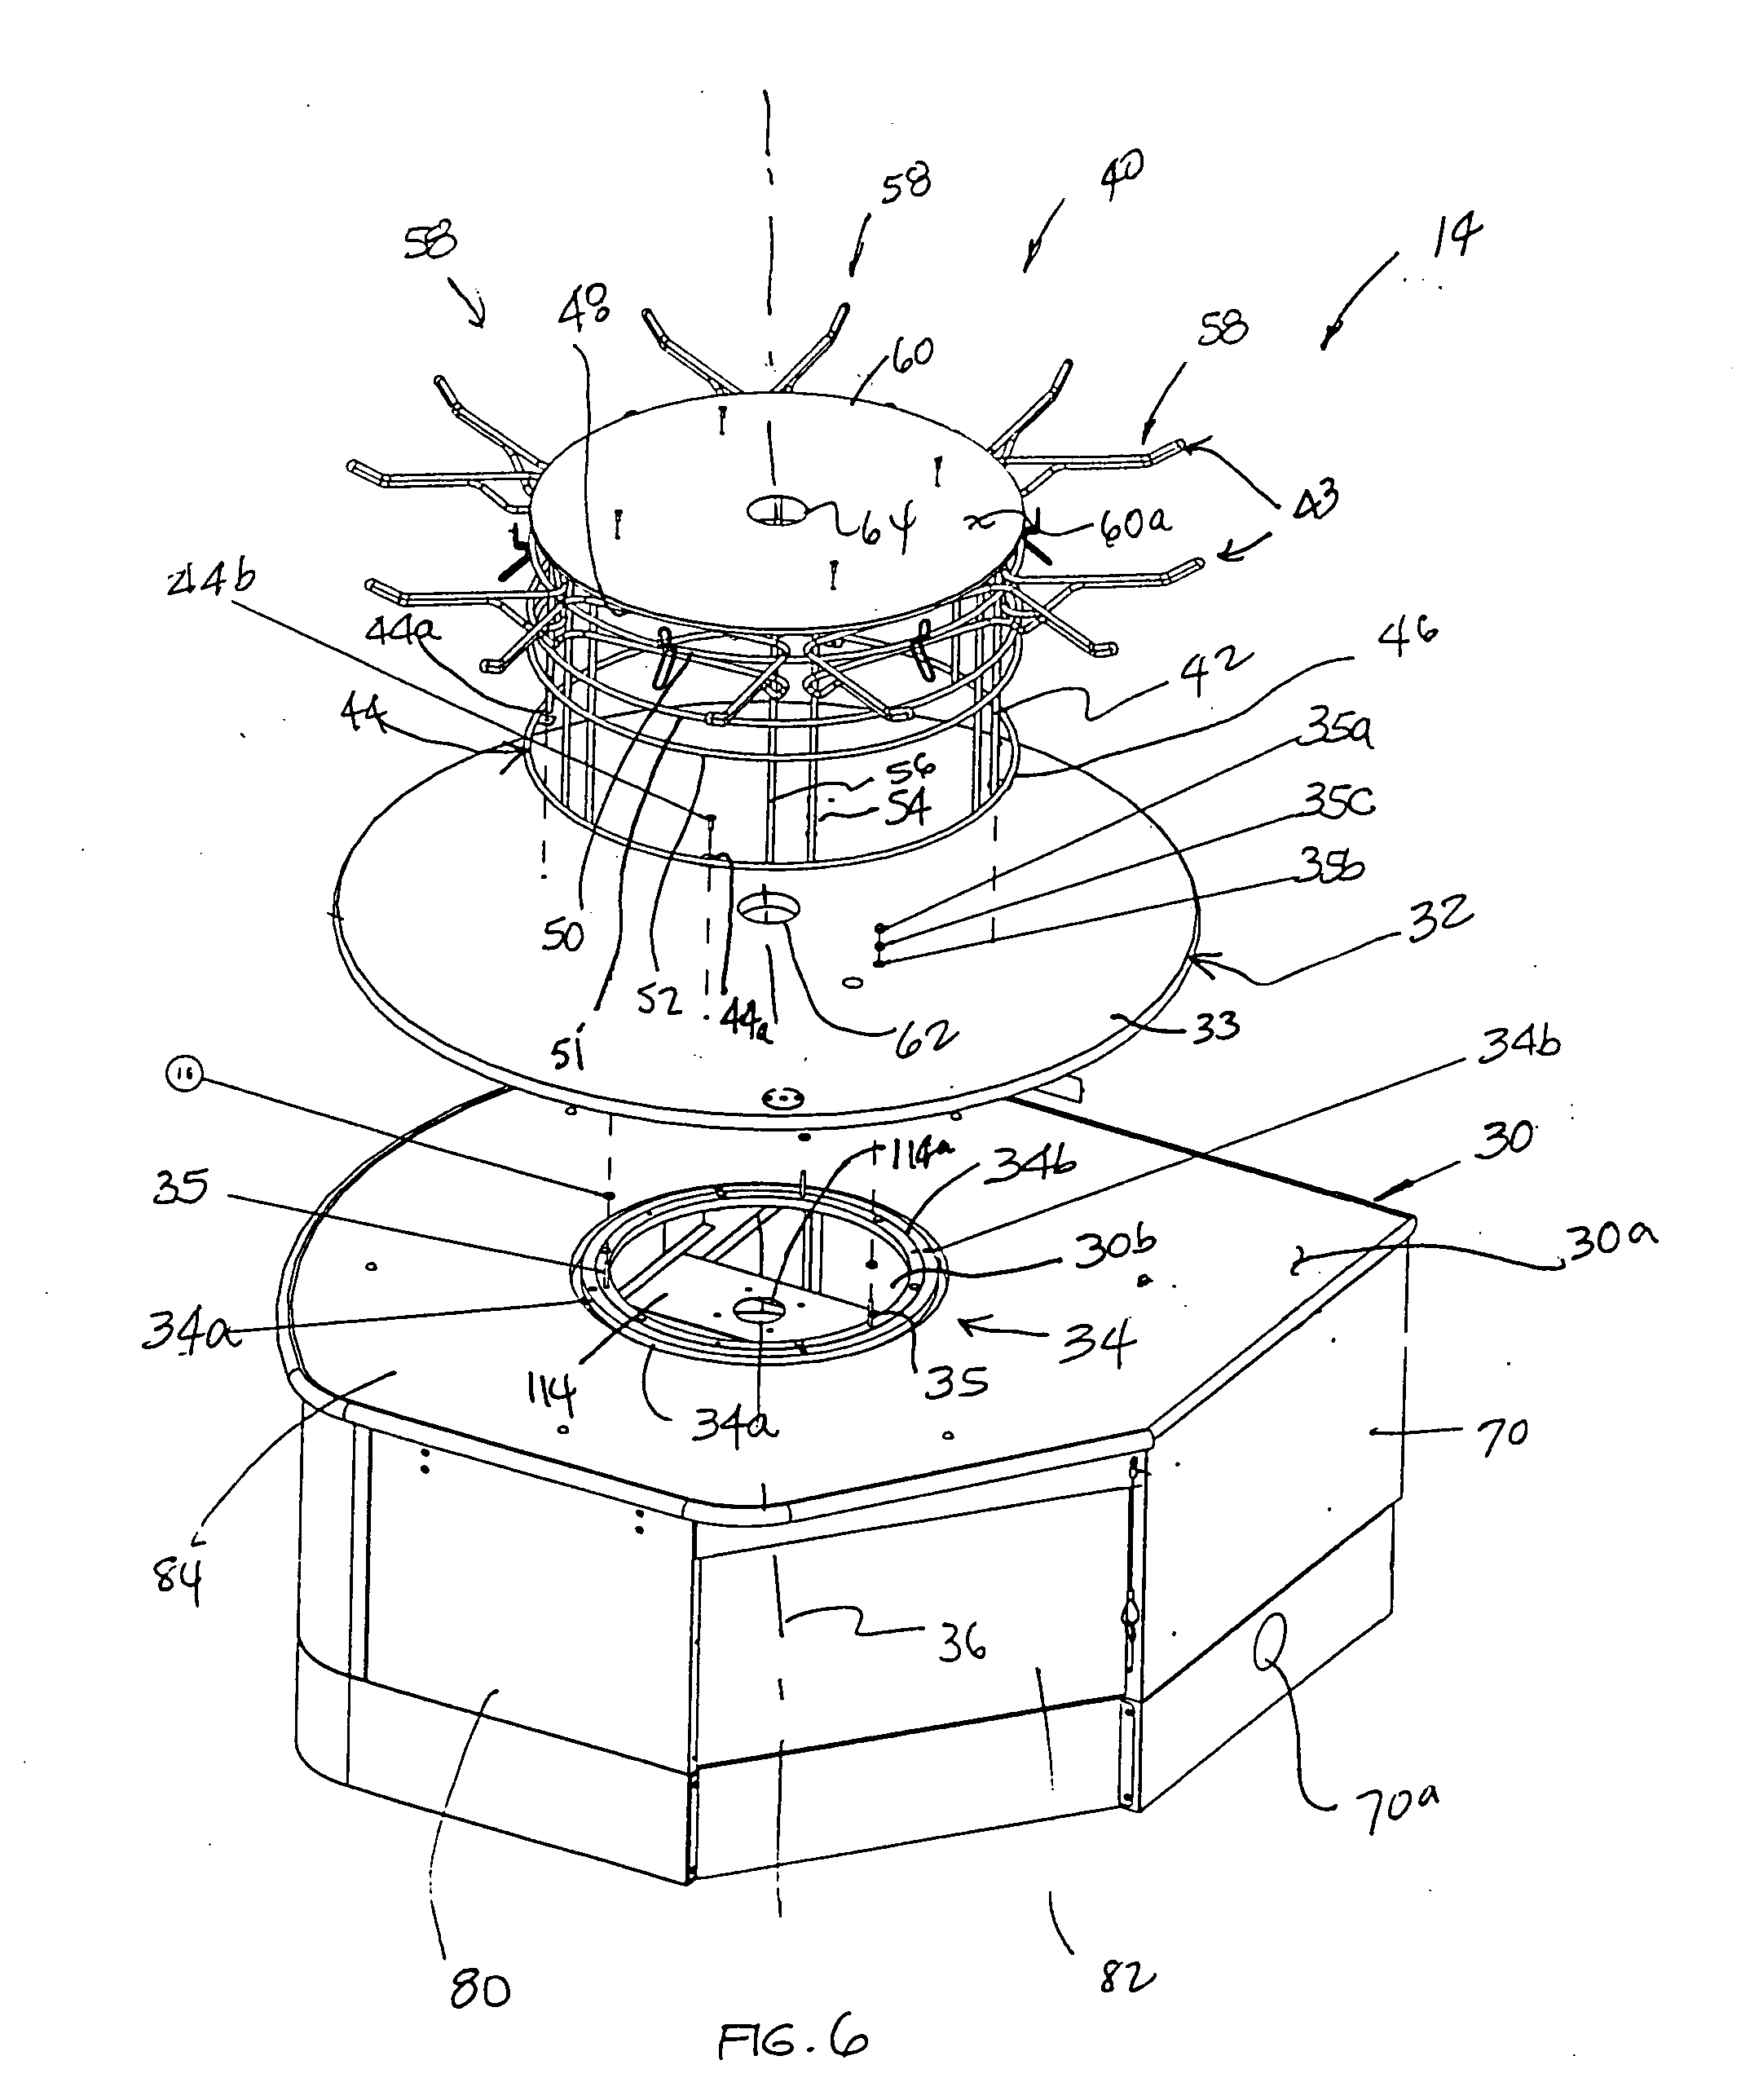 Oldsmobile Bravada Engine Diagram